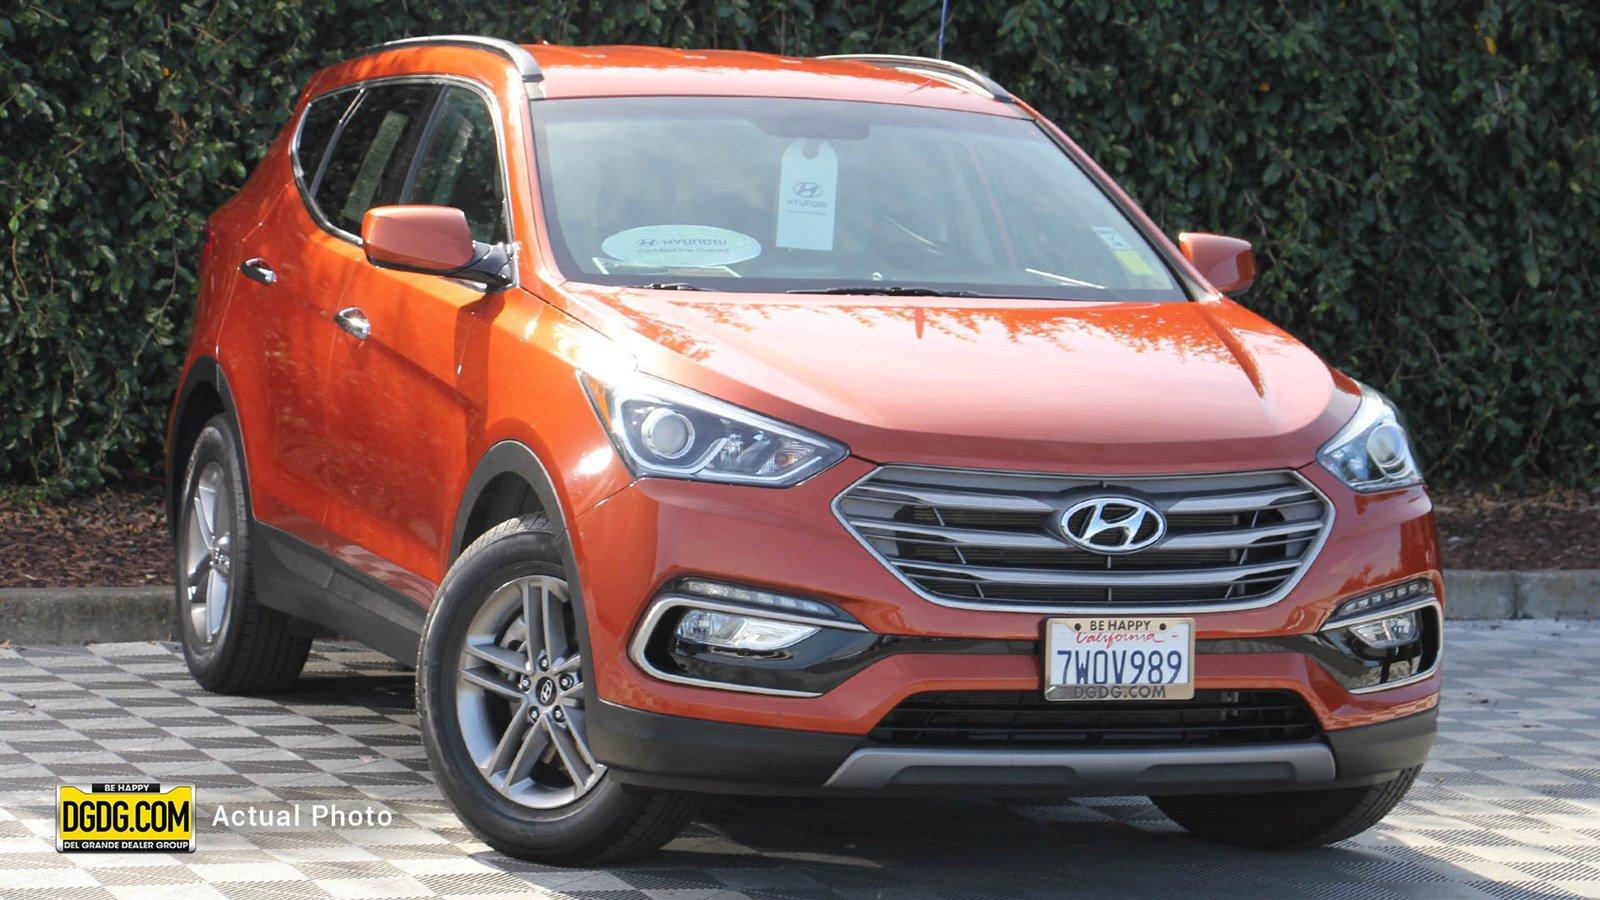 2017 Hyundai Santa Fe FWD Sport image